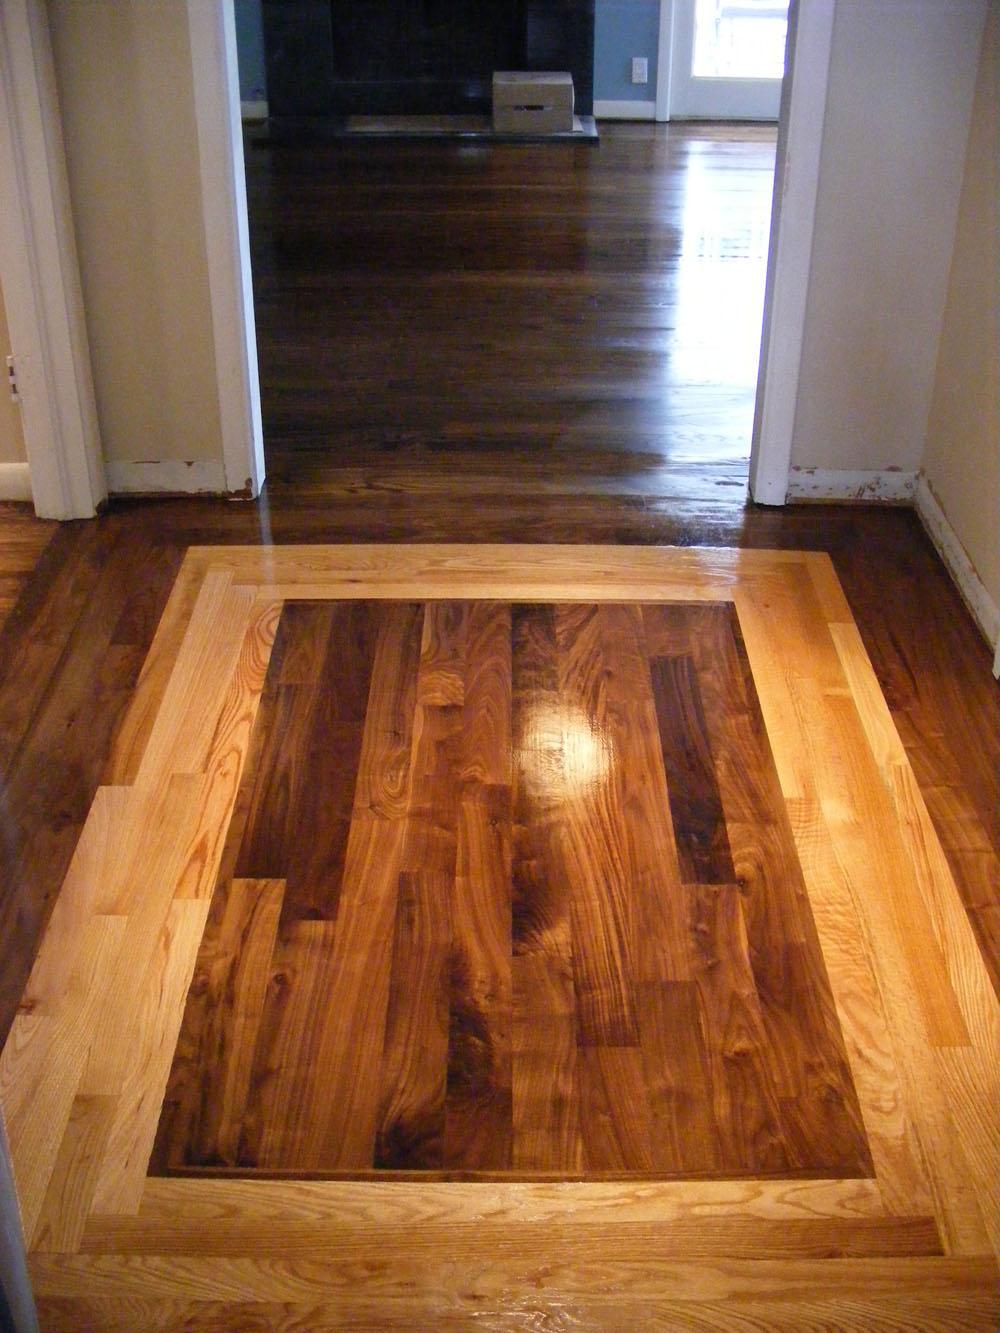 De lago grundl hardwood floors custom american walnut and for Custom hardwood flooring